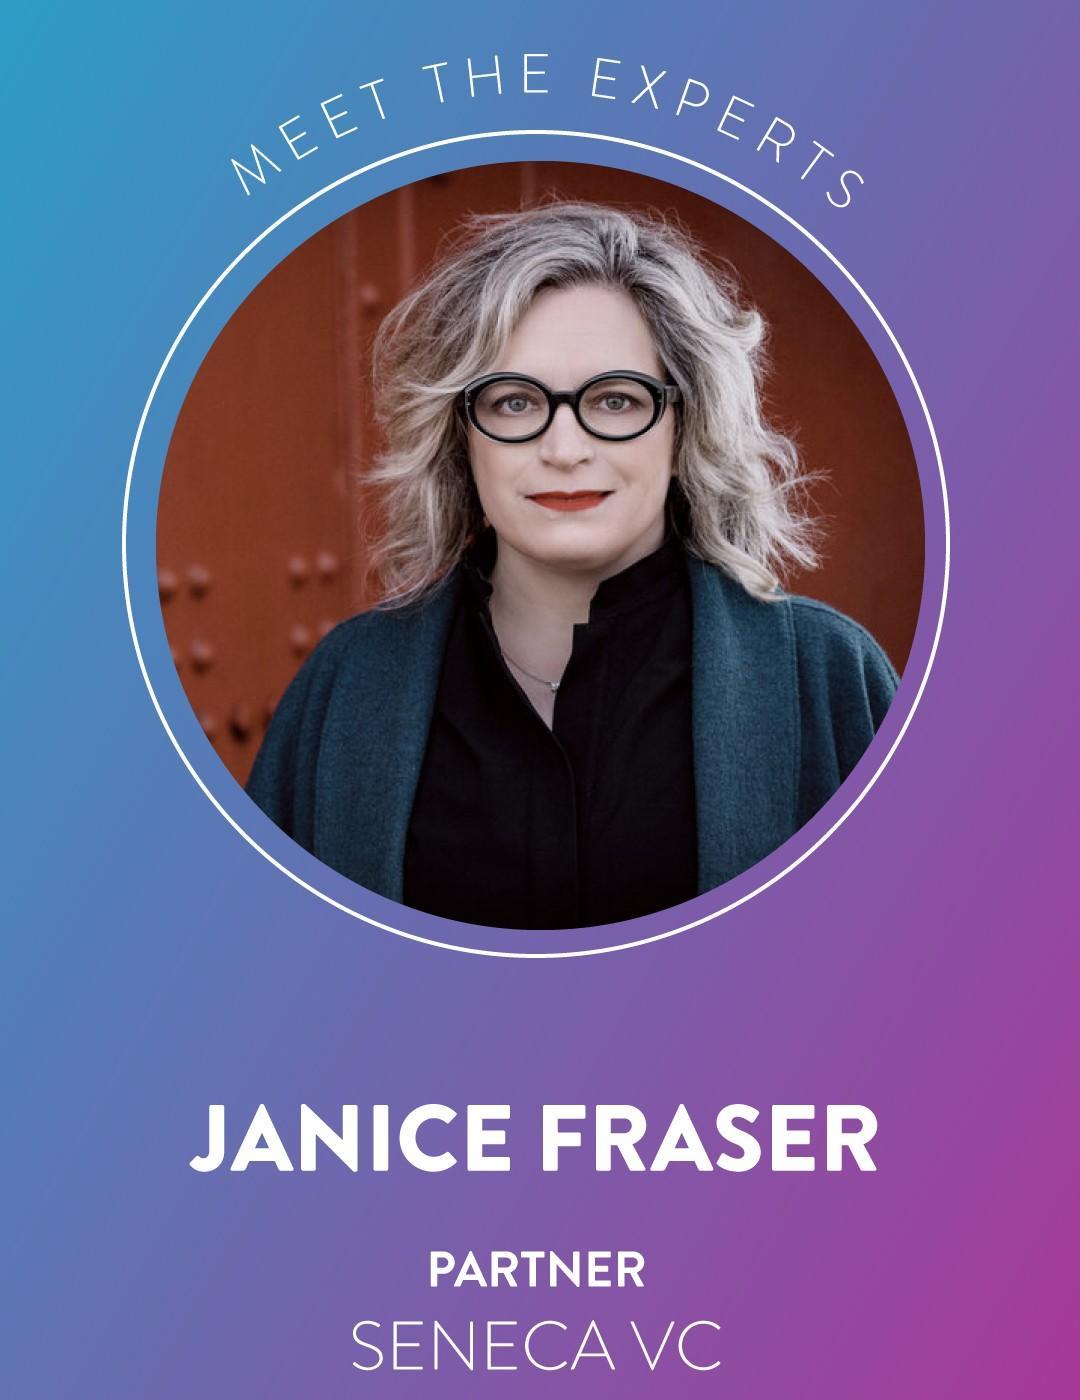 Janice Fraser Partner at Seneca VC